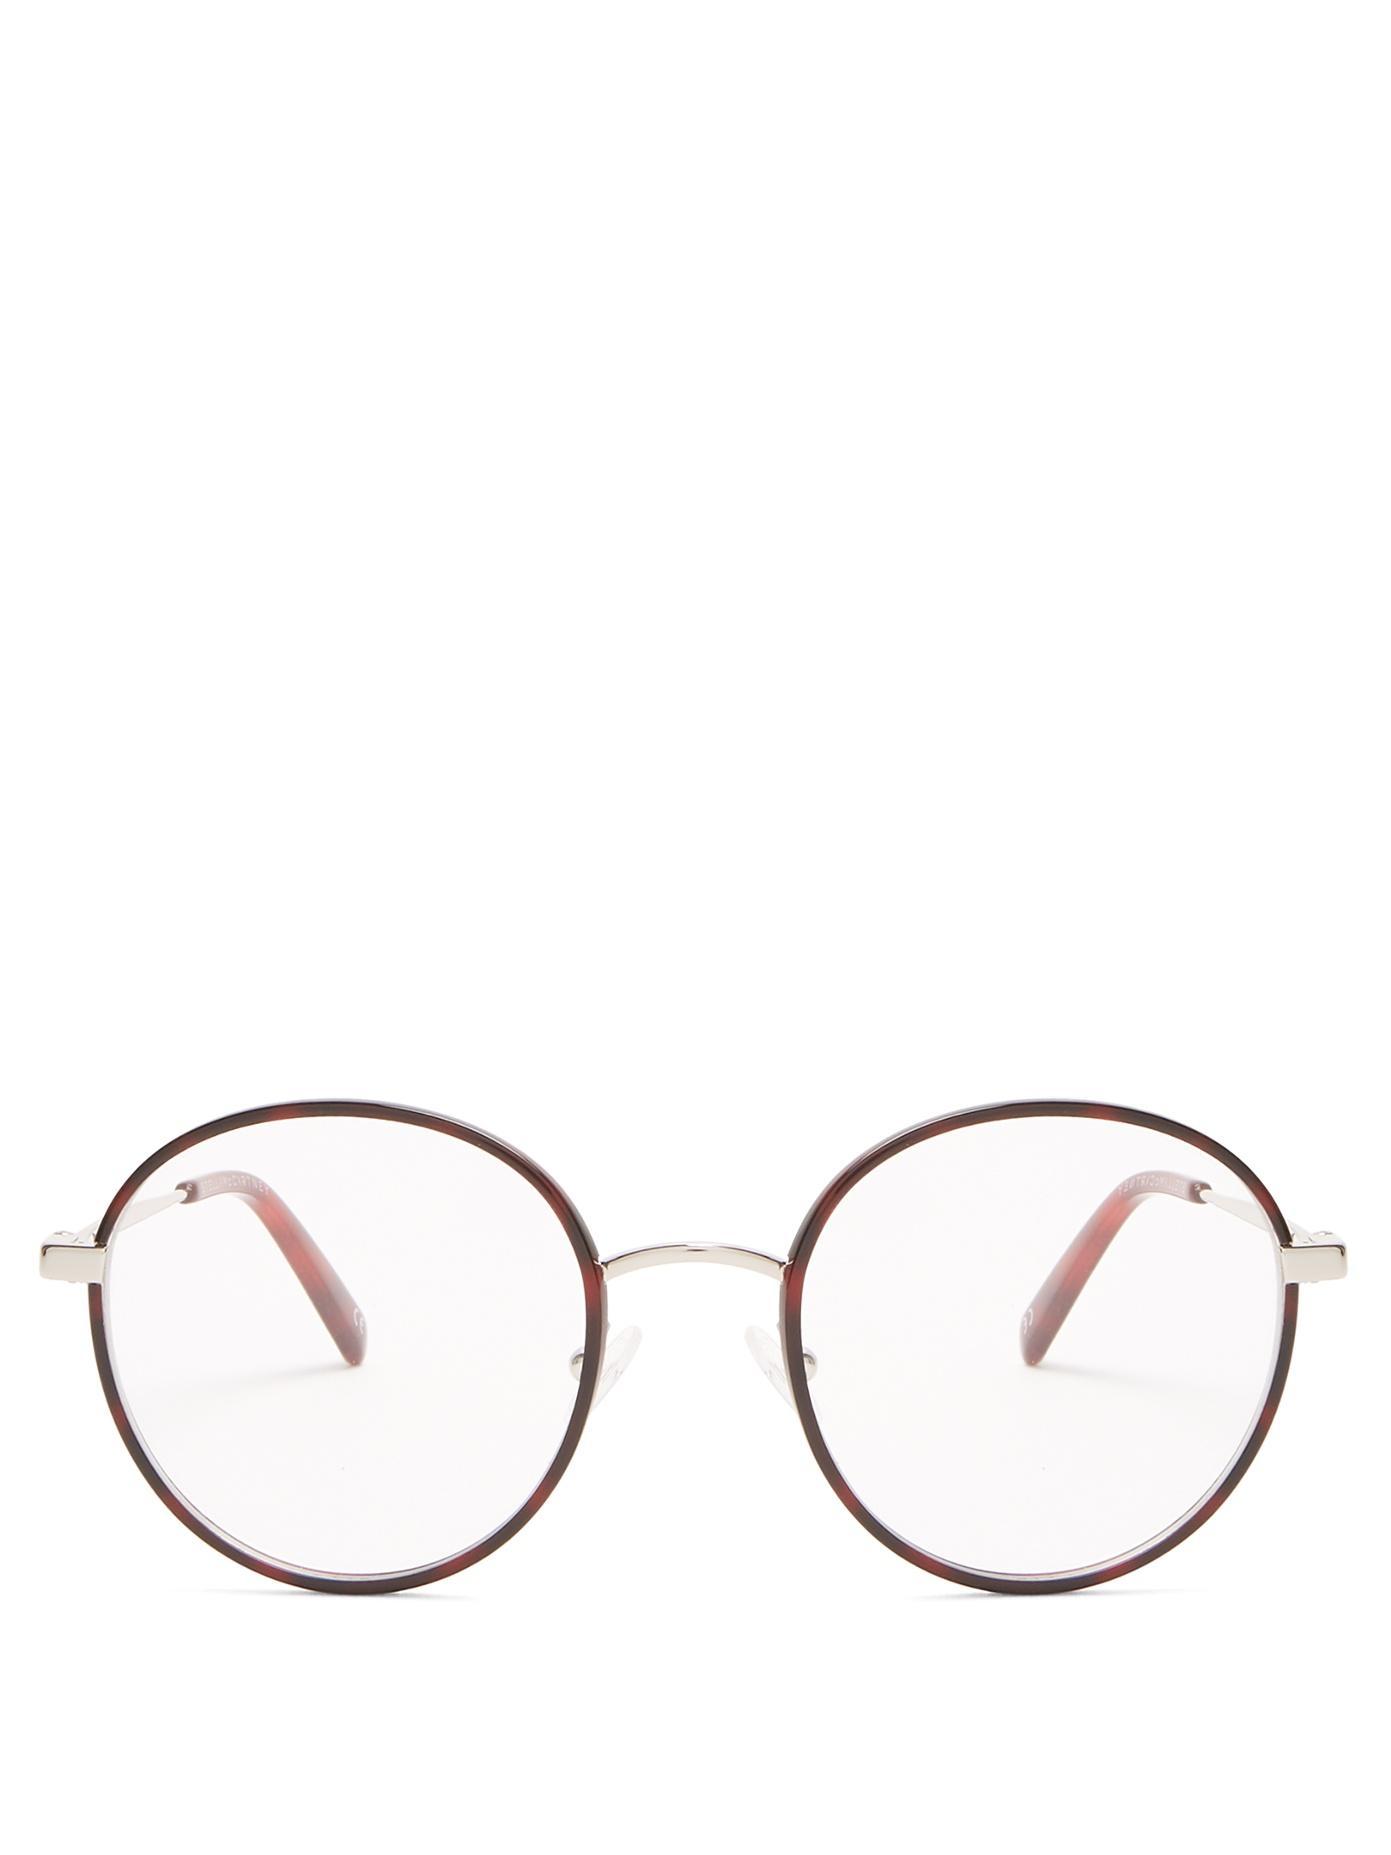 Stella Mccartney - Round Frame Metal Glasses - Womens - Tortoiseshell